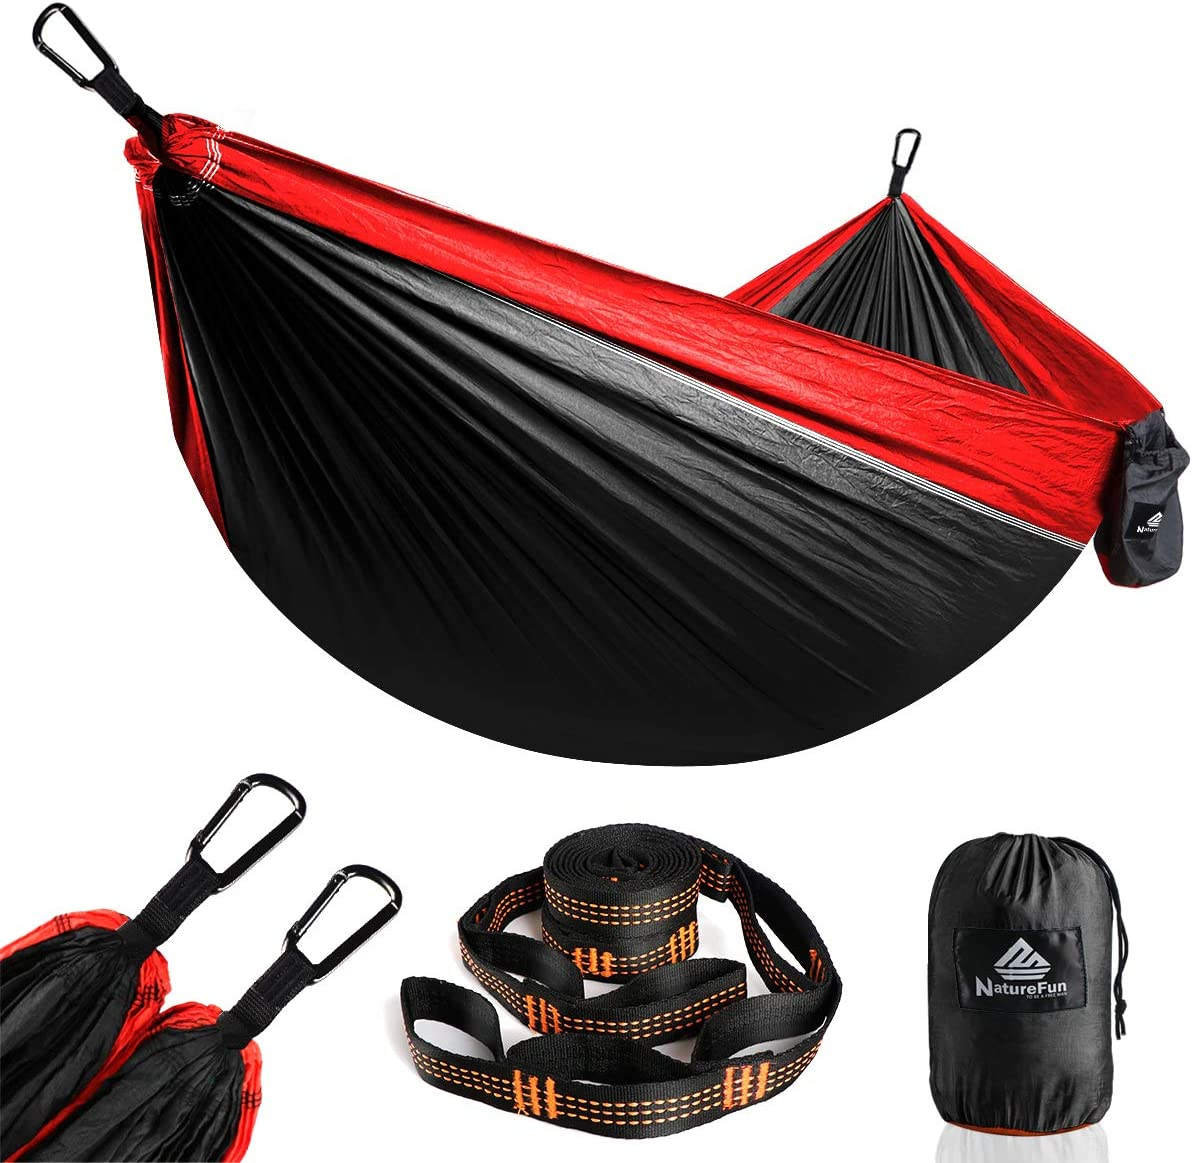 NATUREFUN Hamaca portátil Ultraligera 100% Nailon de paracaídas 300 kg Mochila de Viaje, Camping, Caza, Playa, Patio, Negro/Rojo